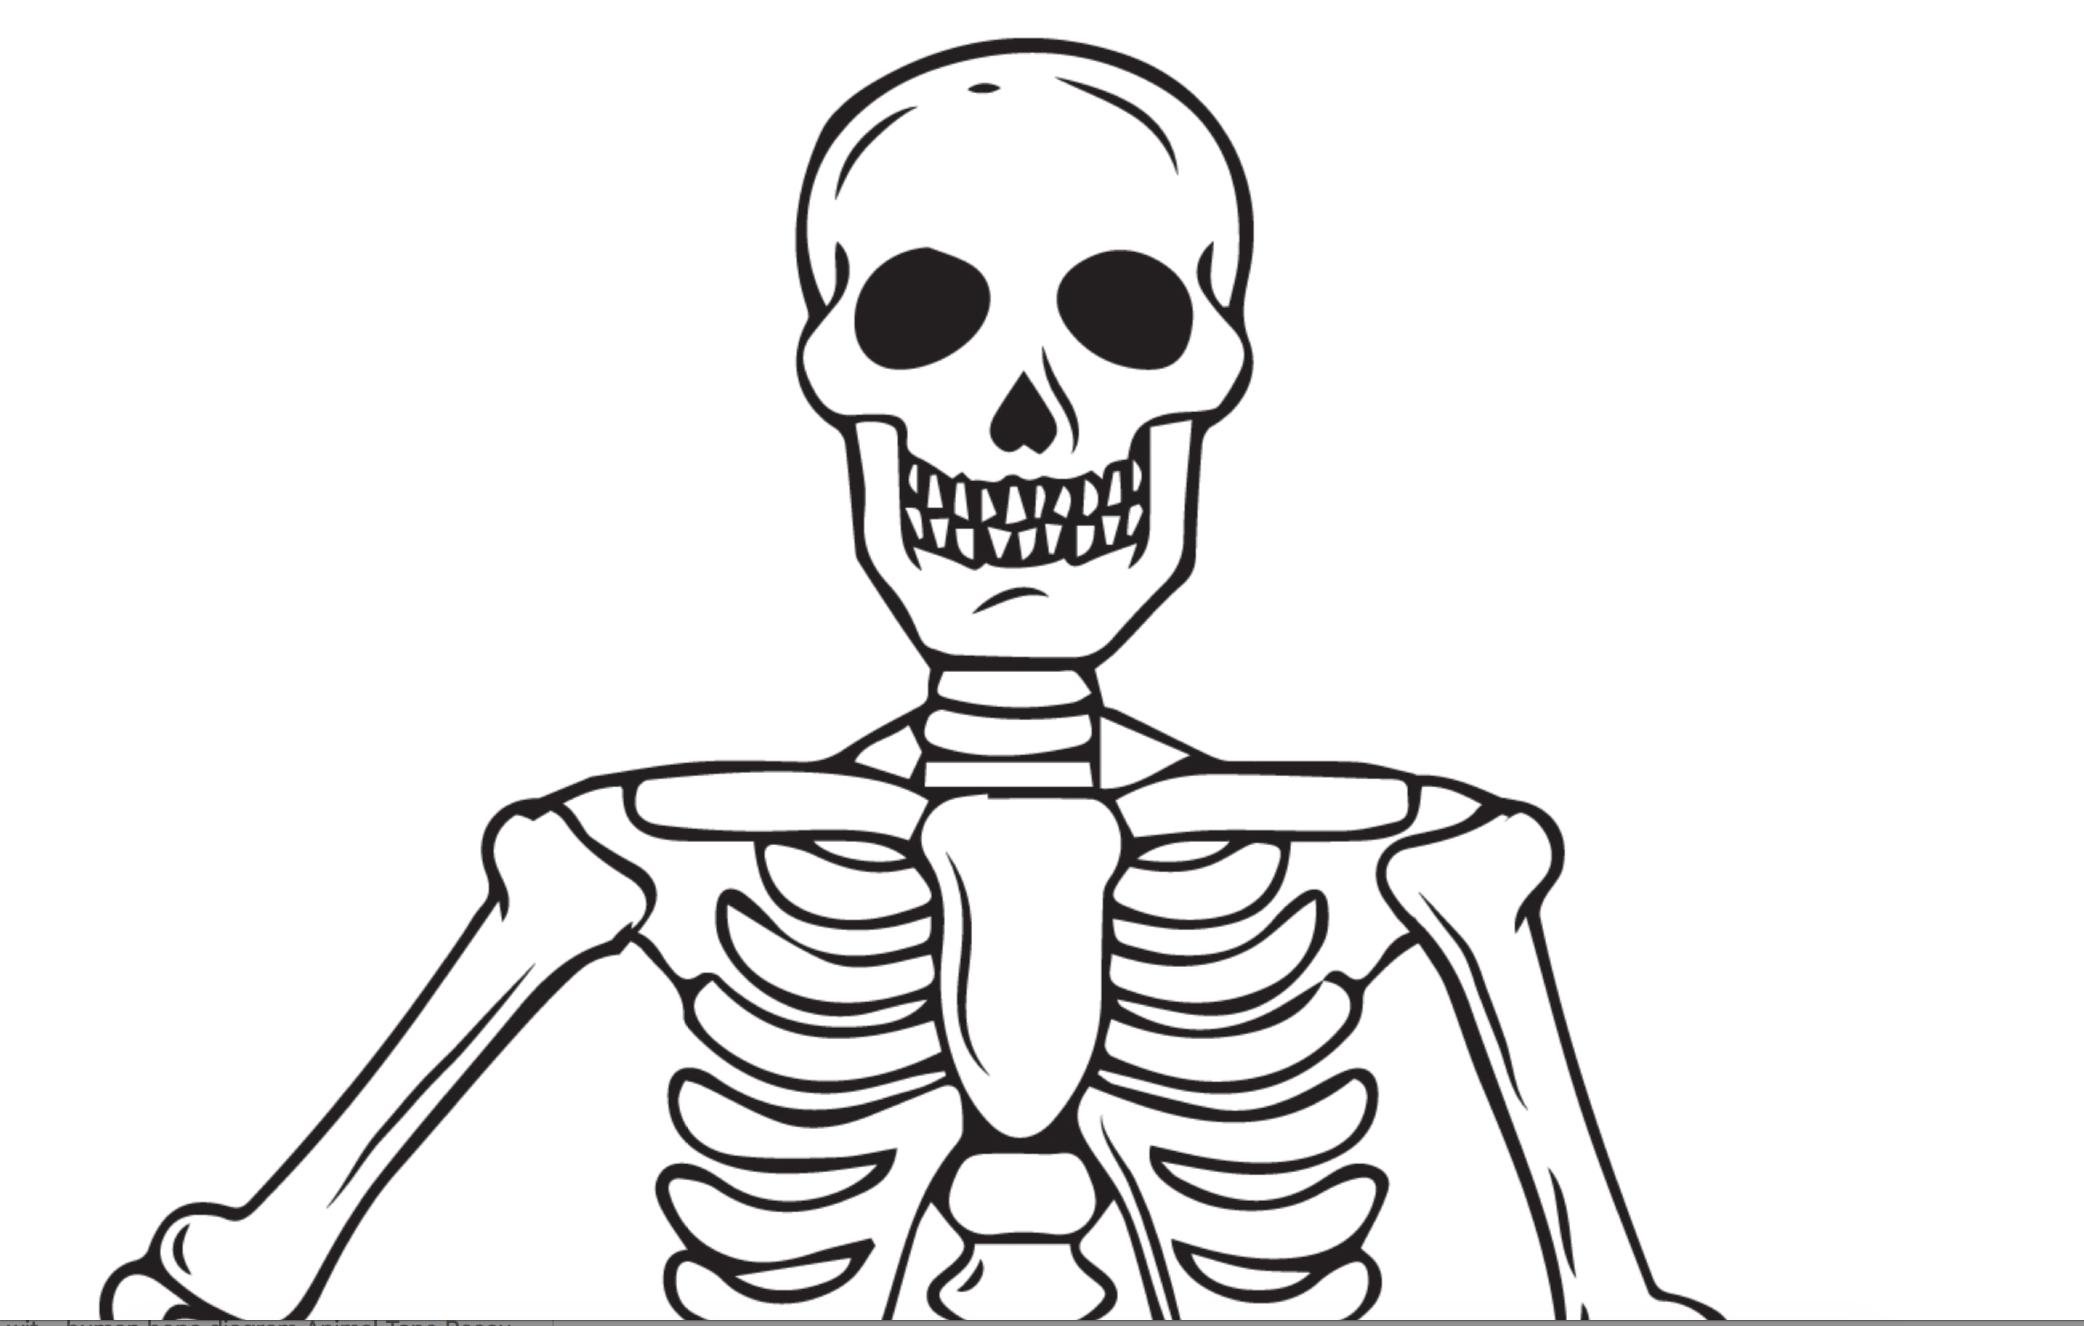 Printable Skeleton Coloring Page For Kids Halloween Coloring Pages Halloween Coloring Coloring Pages